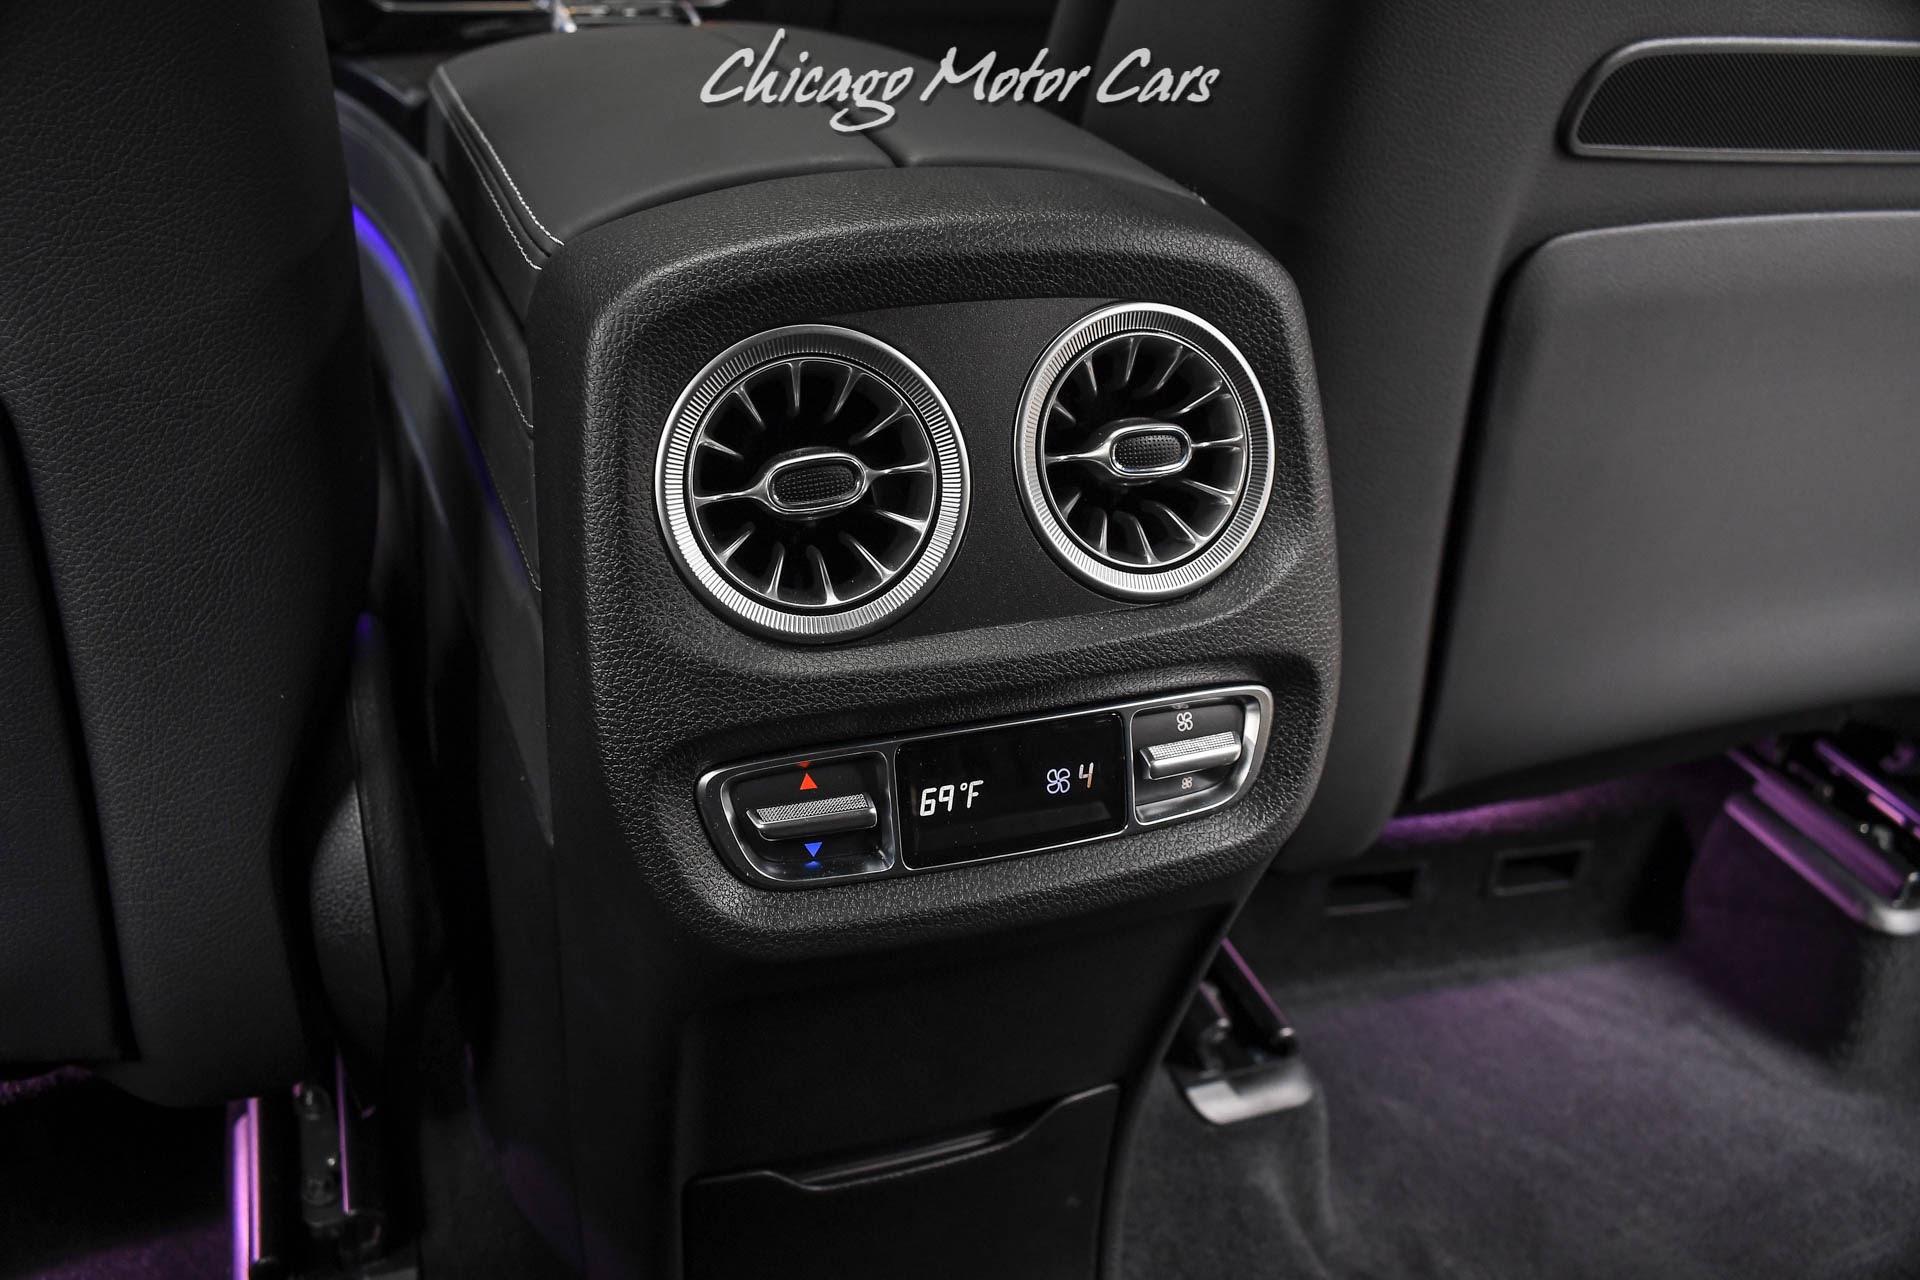 2021 Mercedes-Benz G63 AMG G63 4MATIC Exclusive Interior Package! Carbon Fiber! Magno Black ...